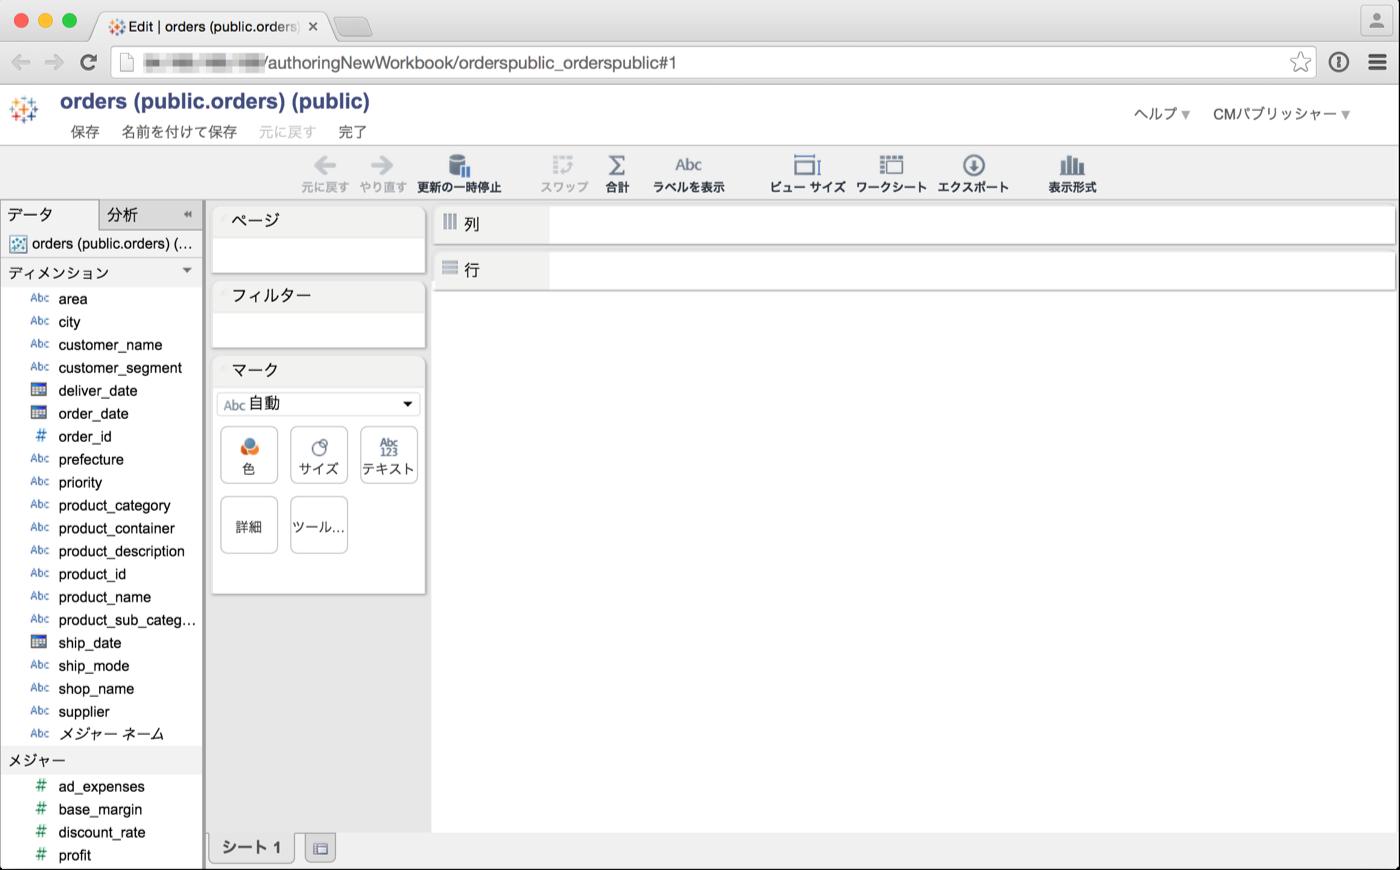 tableau-server-editing_02-04